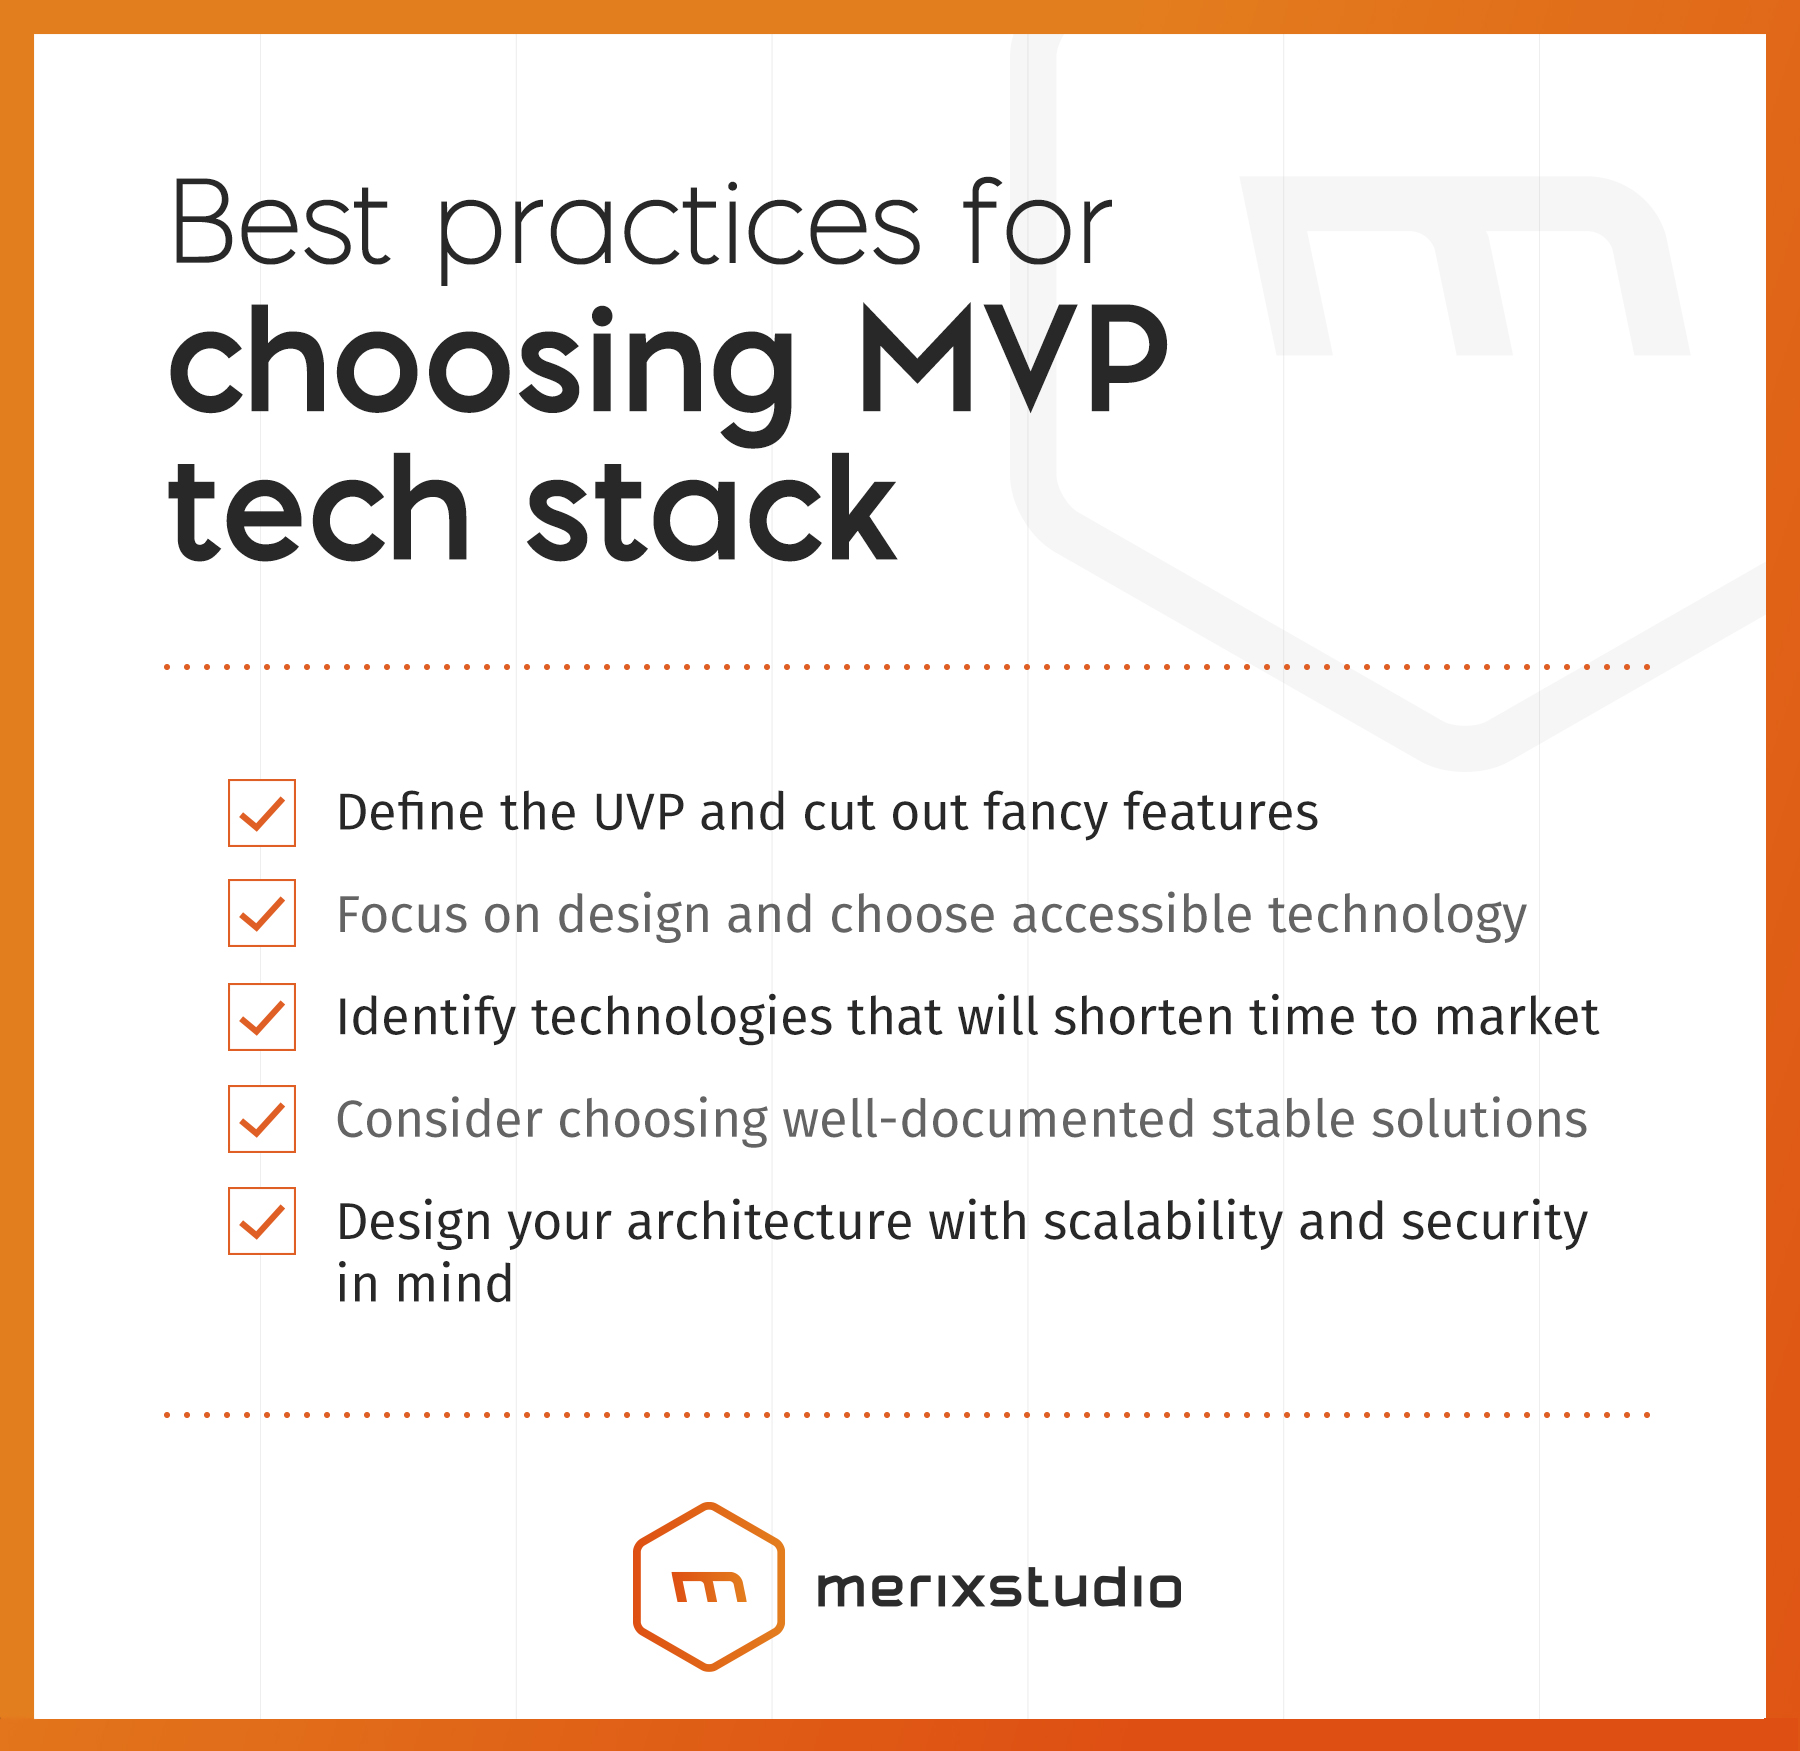 Best practices for choosing MVP tech stack